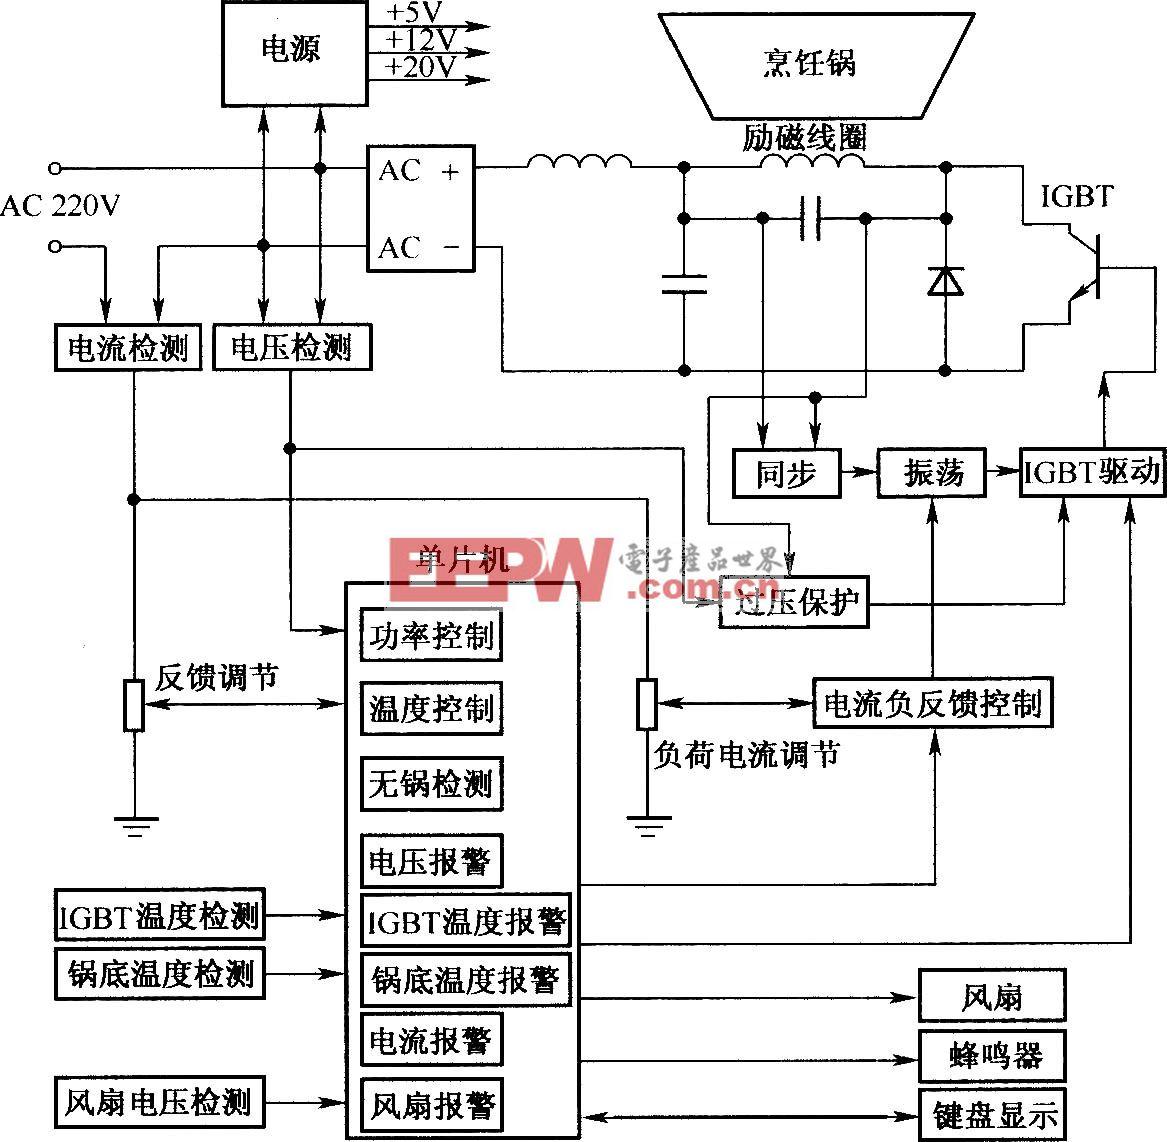 IGBT在电磁炉中应用的系统框图